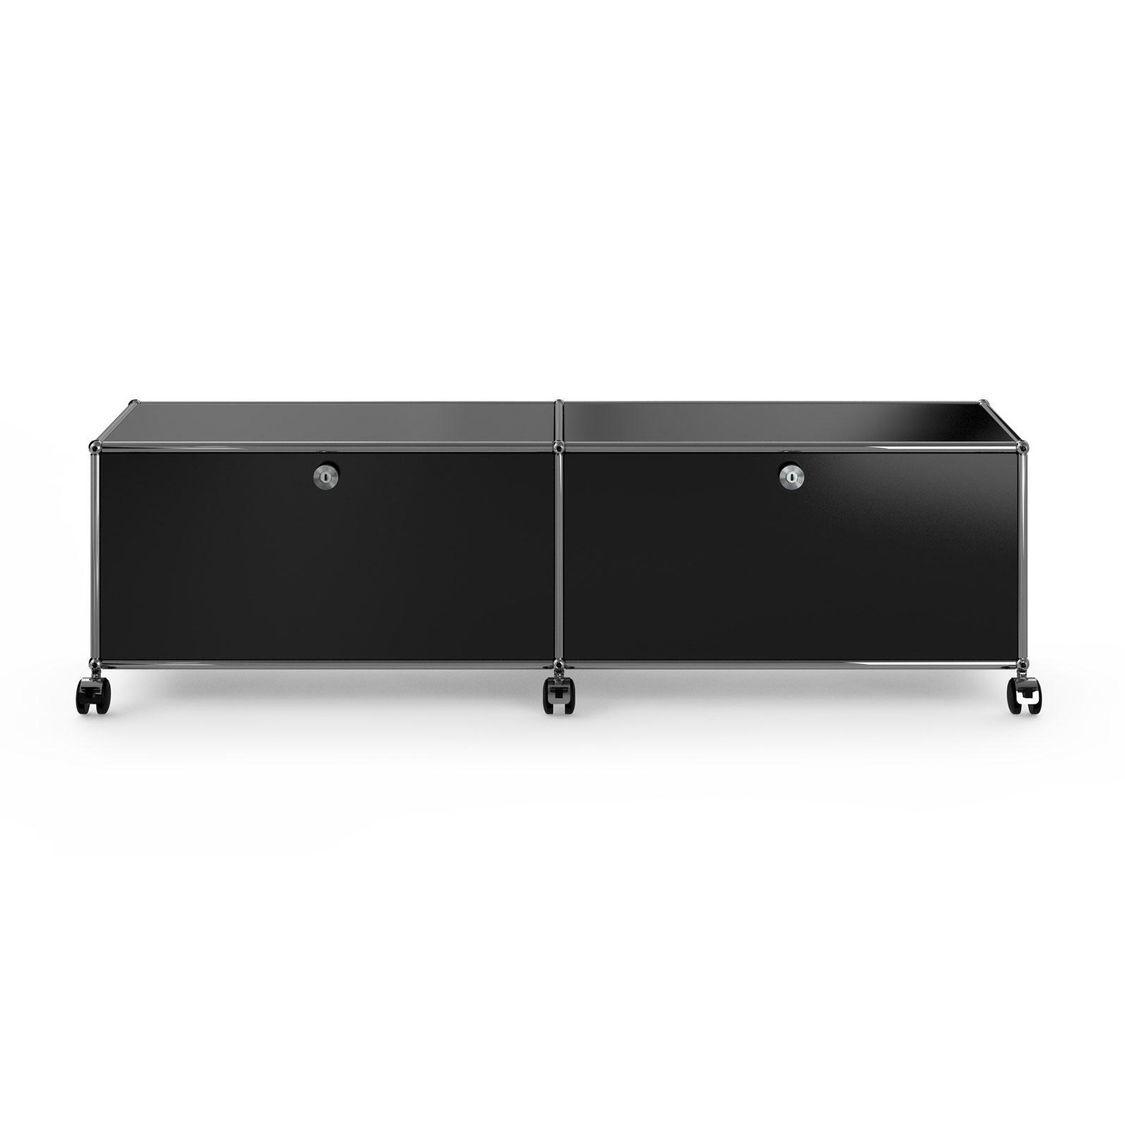 Usm Hi Fi Tv Board With 2 Folding Boards Usm Haller  # Meuble Tv Fold